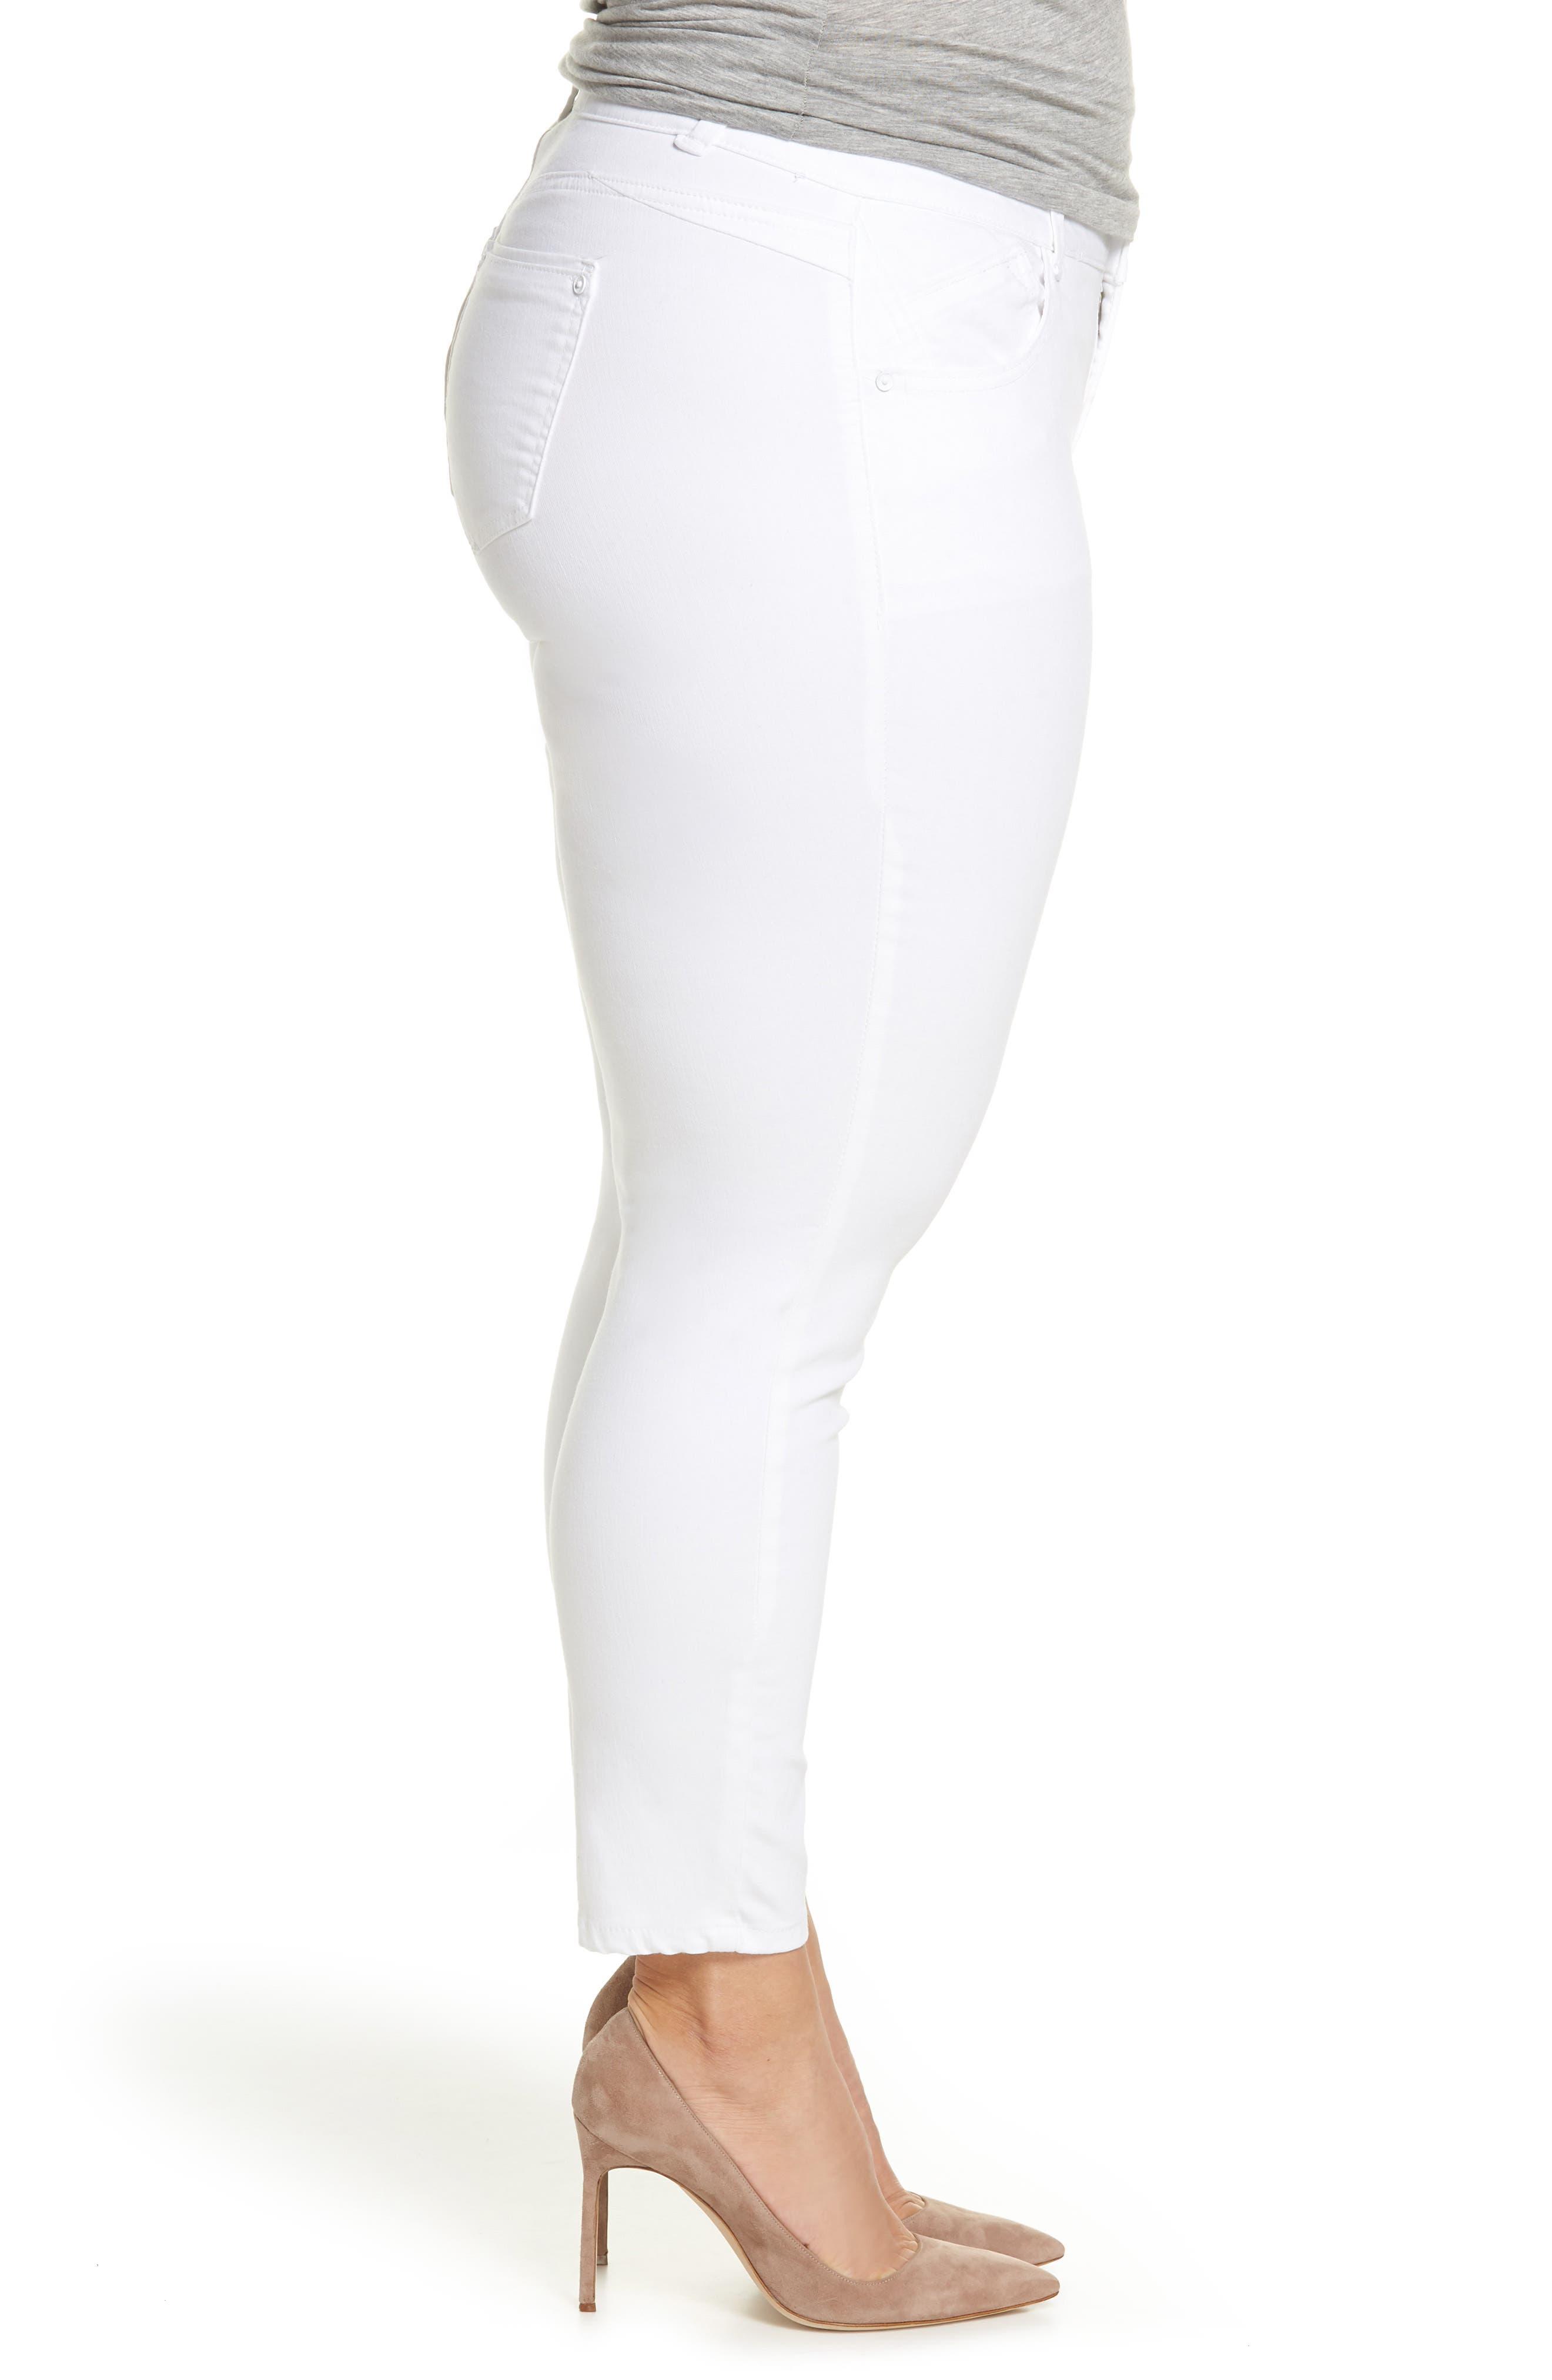 Ab-solution Ankle Skimmer Jeans,                             Alternate thumbnail 3, color,                             Optic White